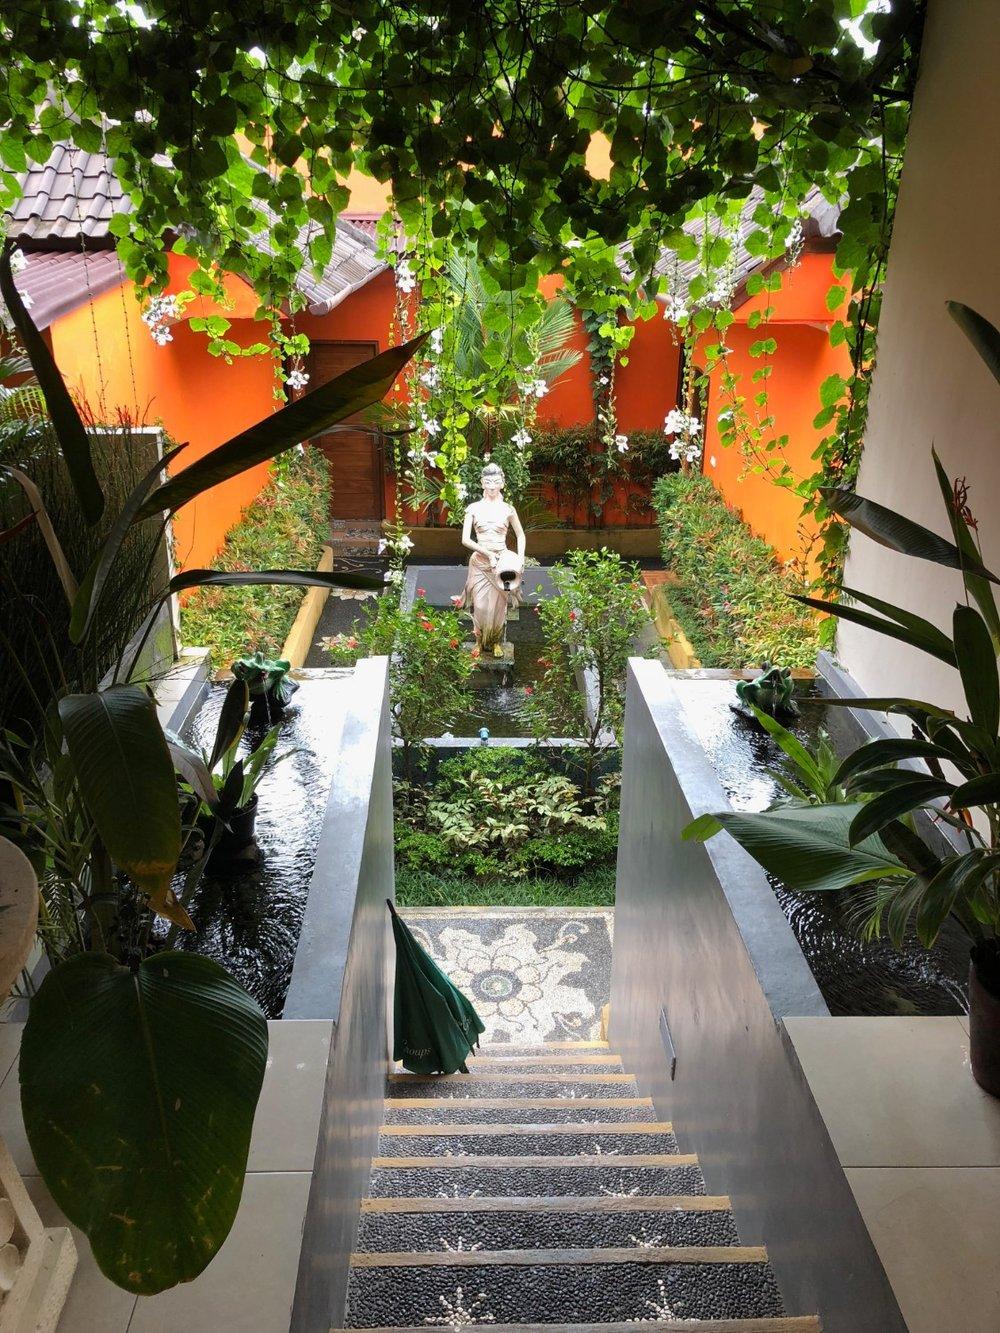 Putri Day Spa in Ubud, Bali. bodlygotravel.com